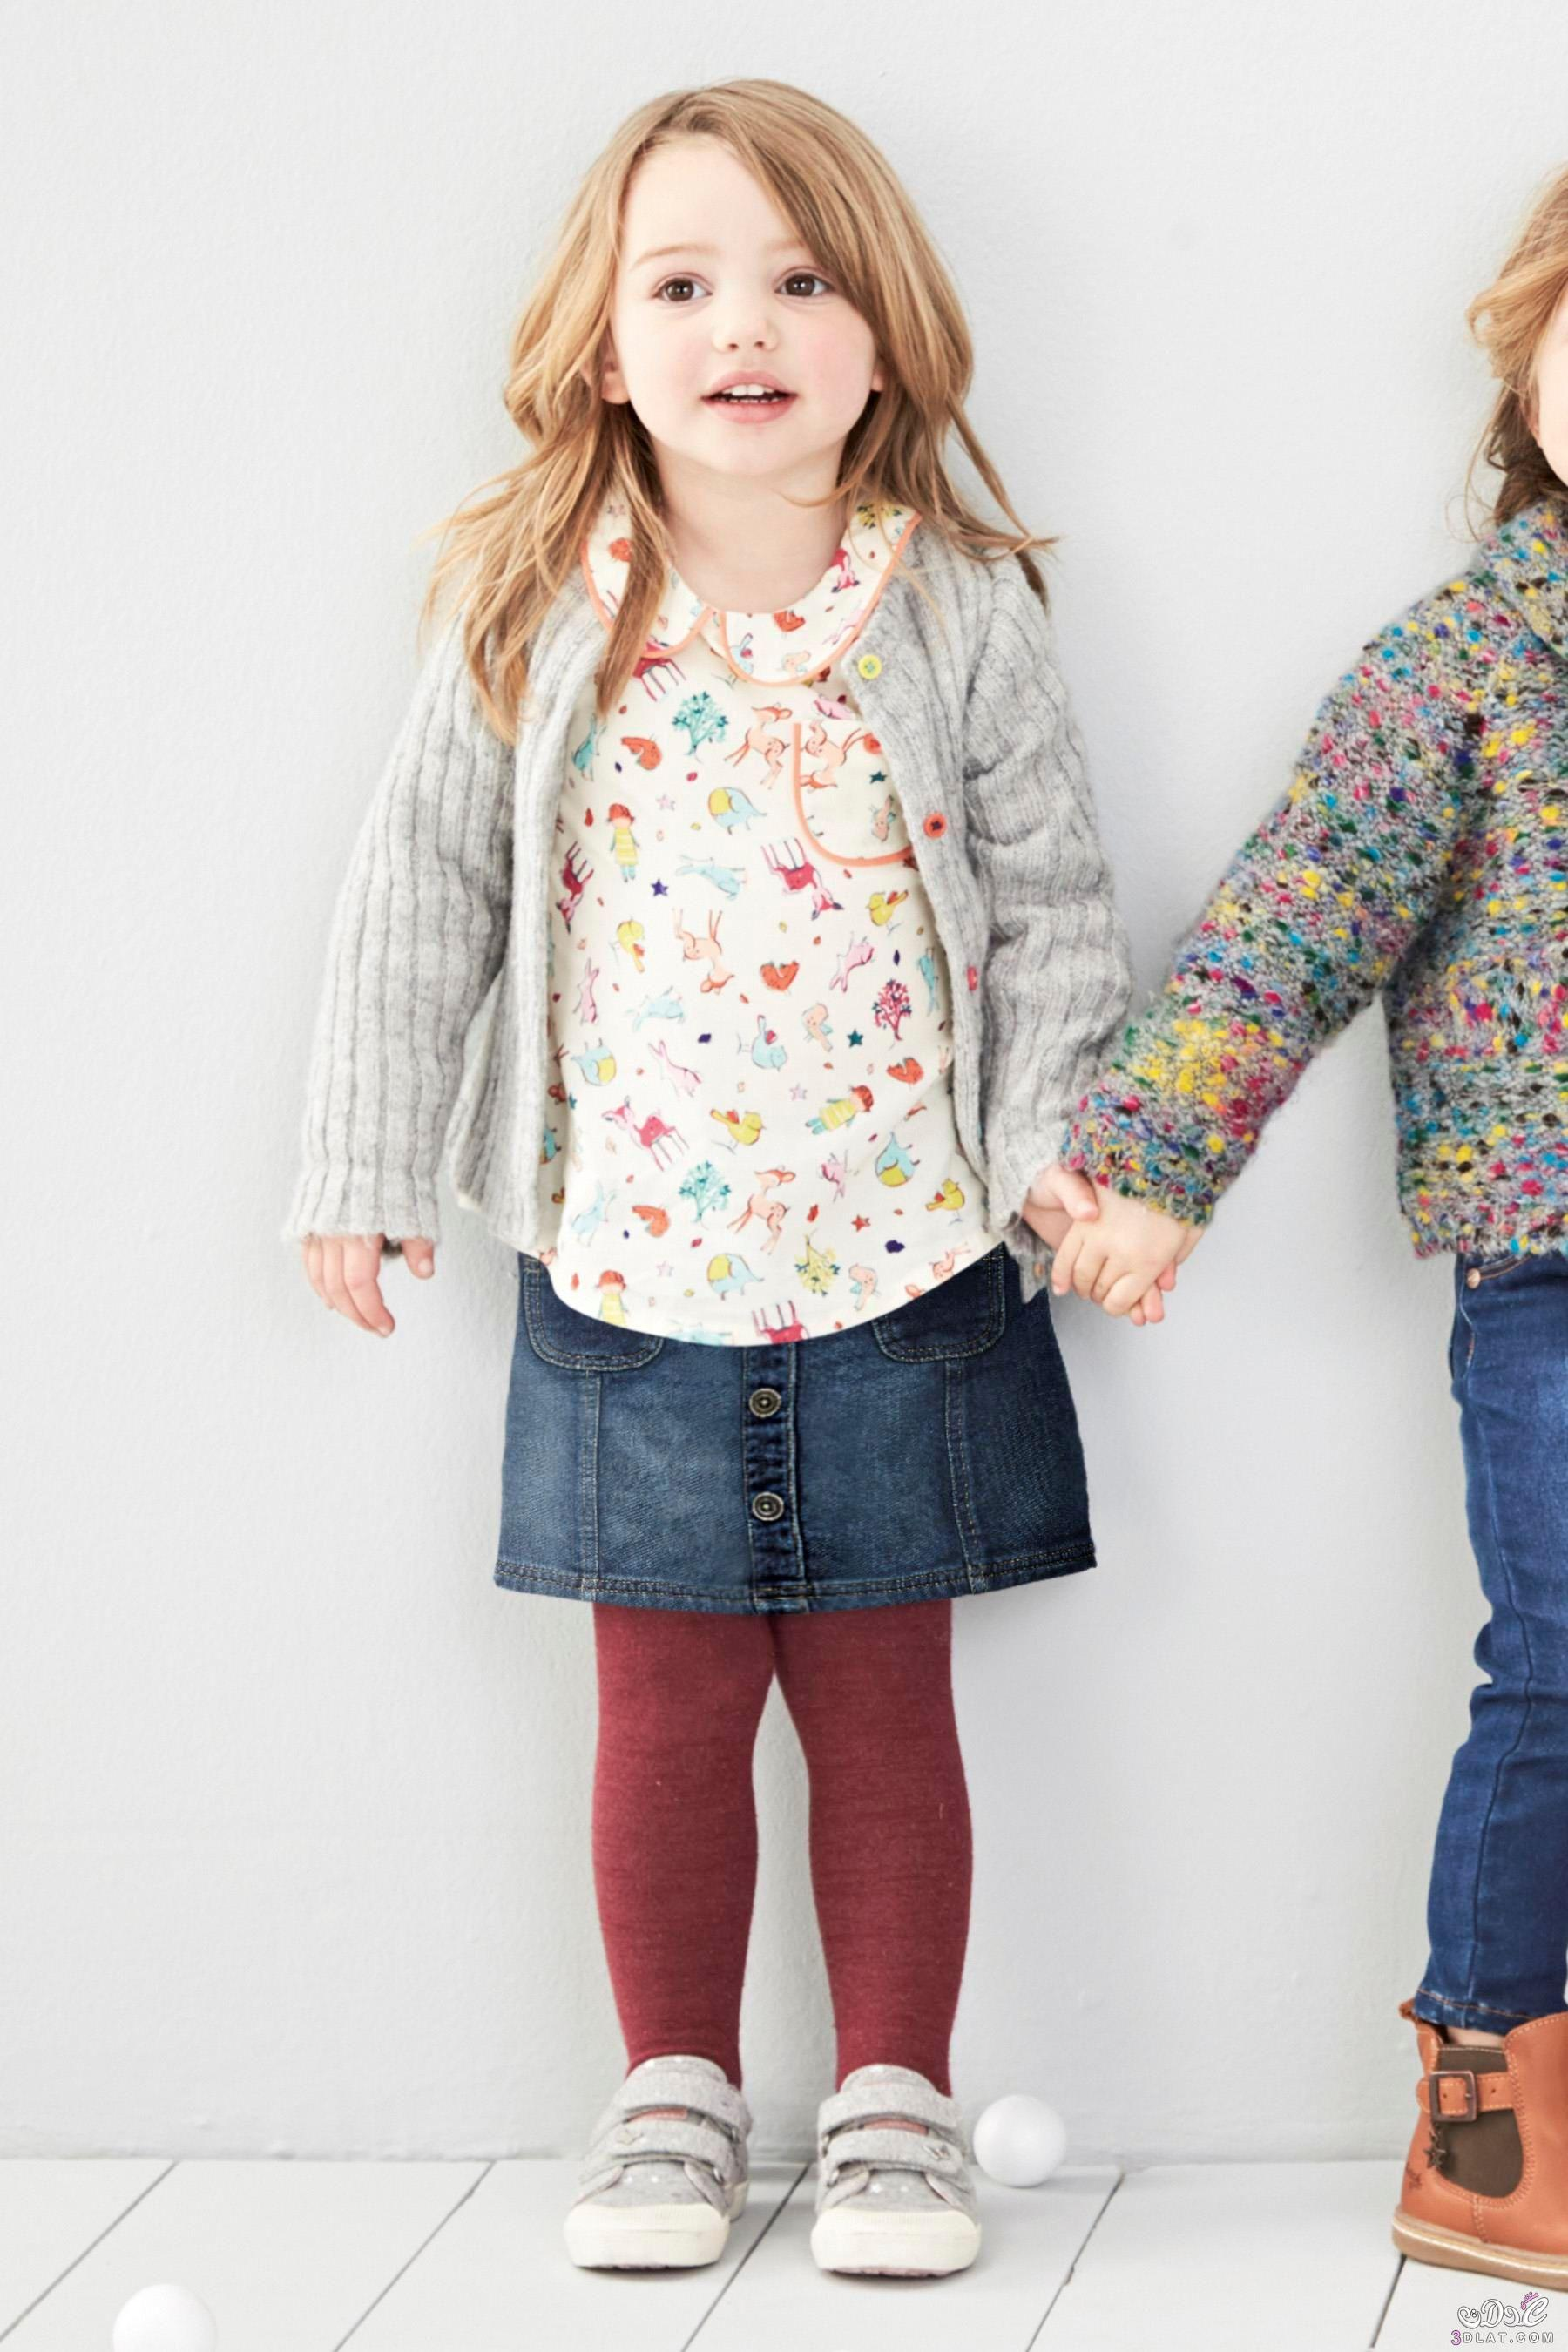 db5632a04 صور ملابس اطفال , ملابس شيك وجميله للاطفال - قصة شوق